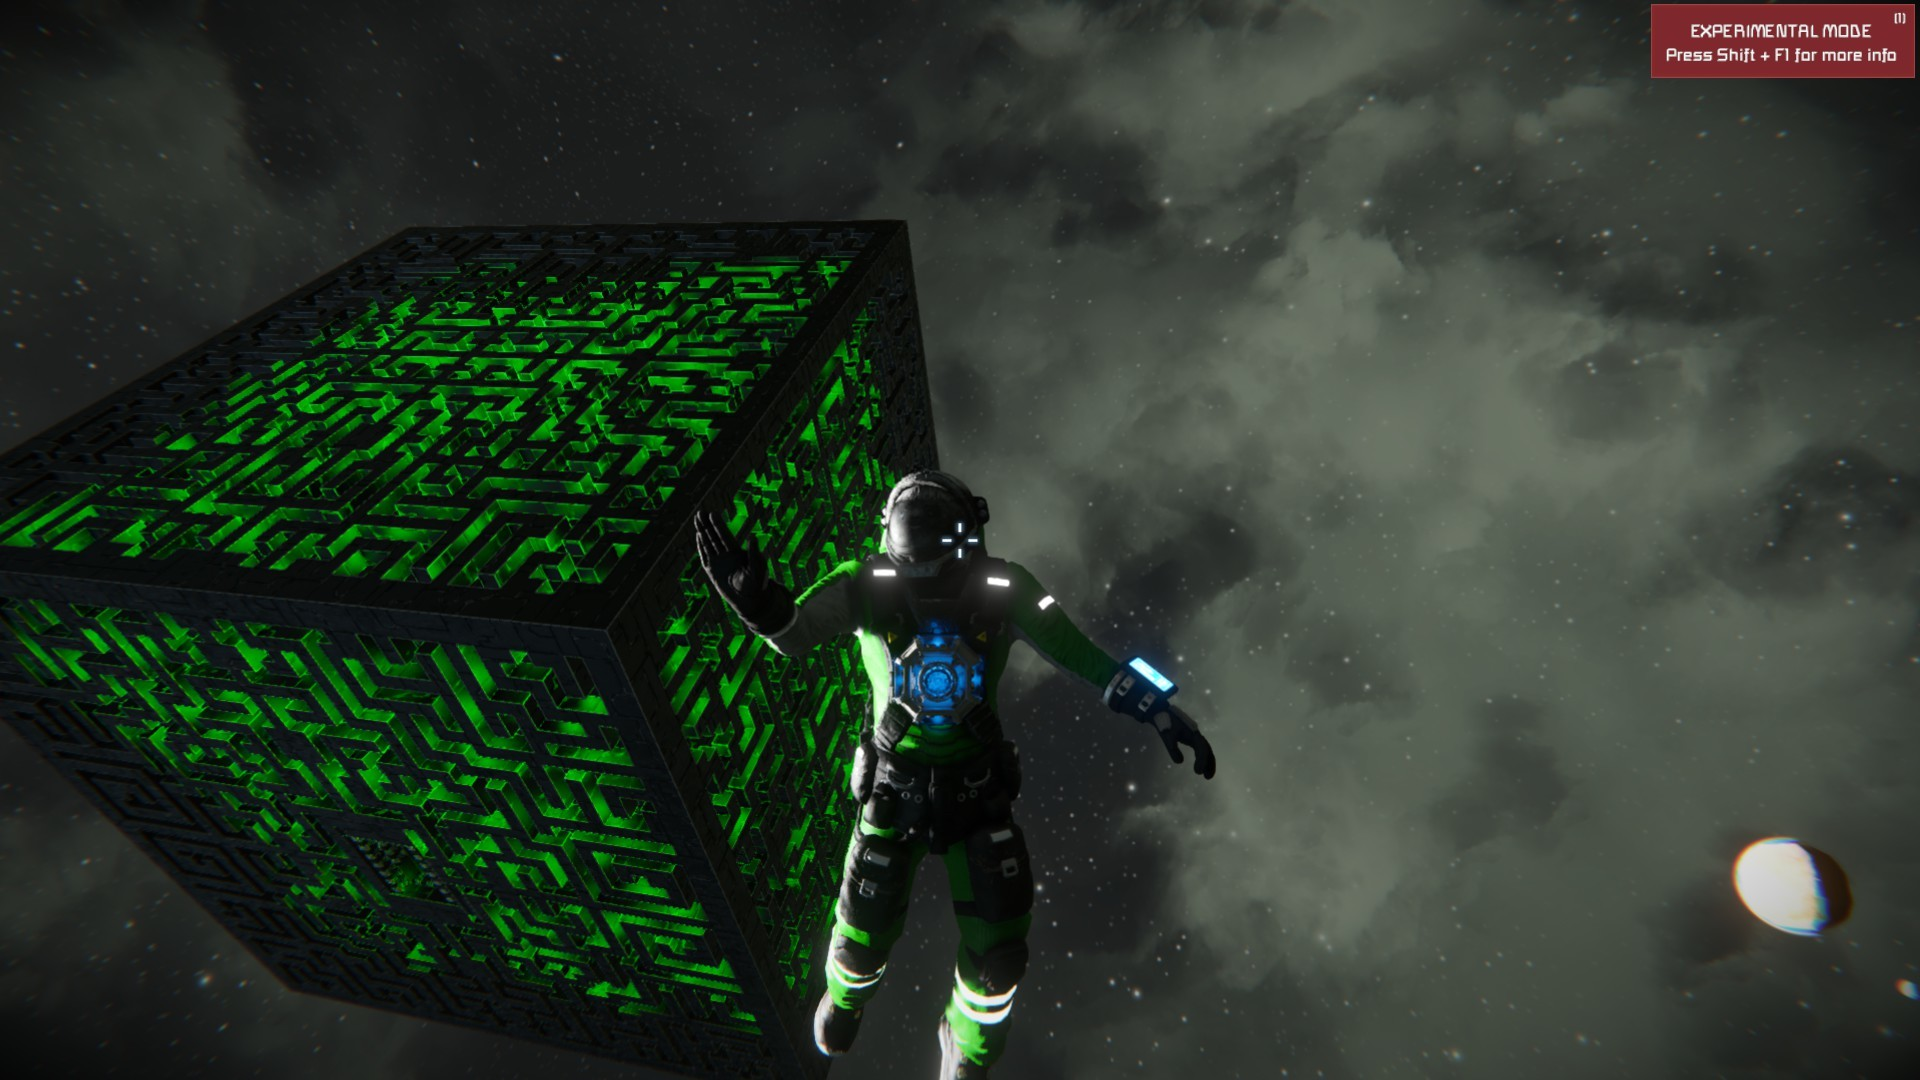 Star trek green wallpaper